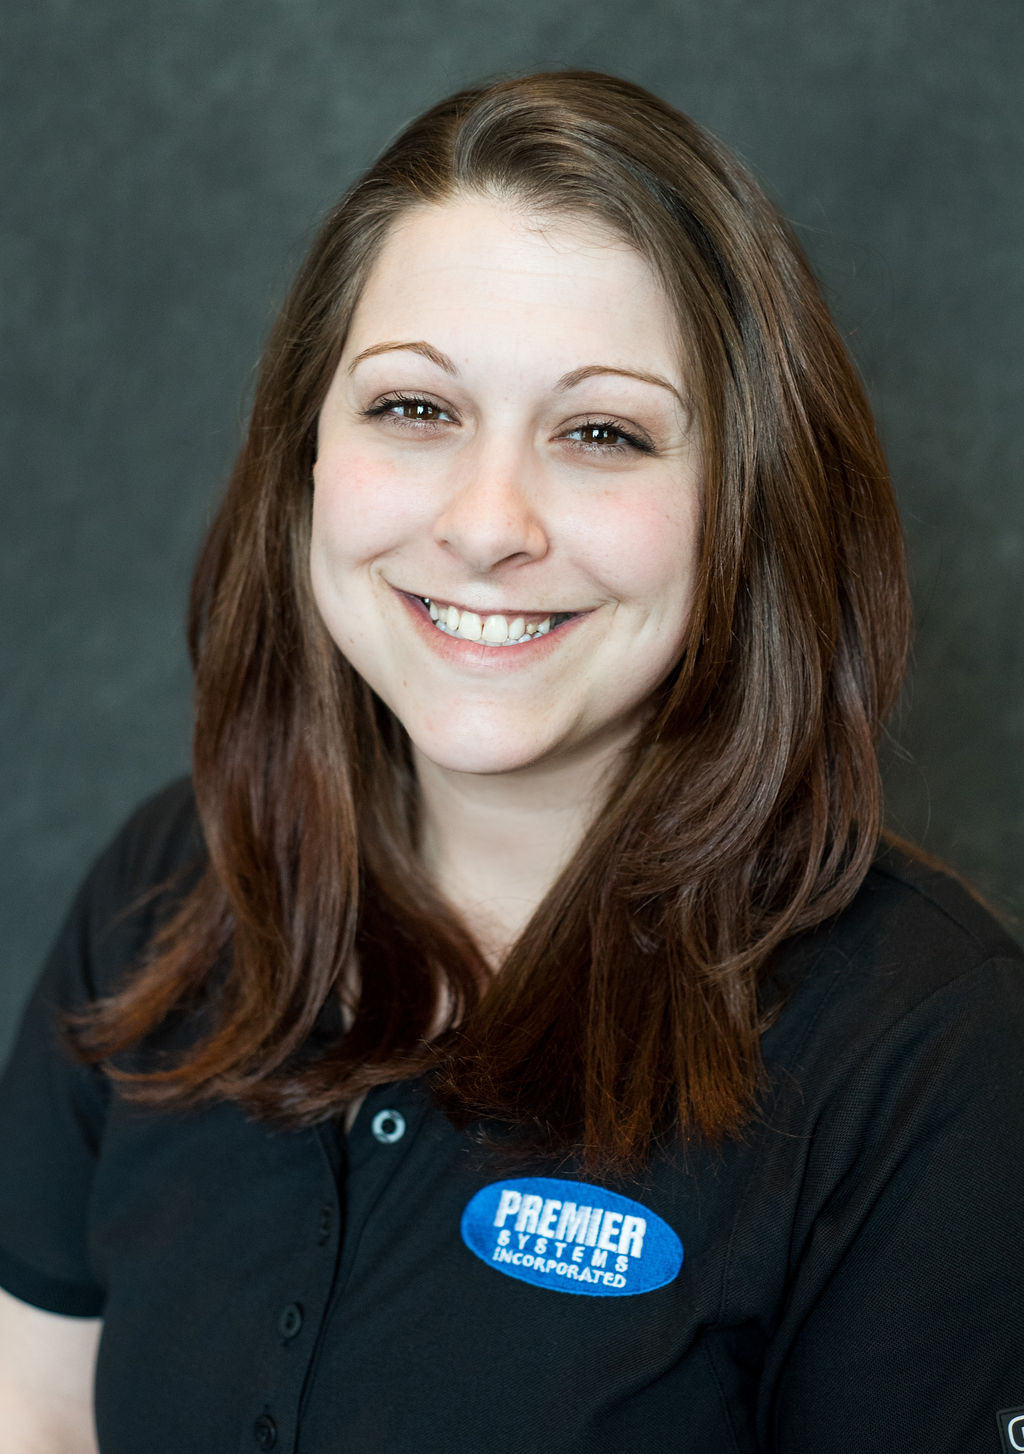 Janelle S. - Insurance Specialist